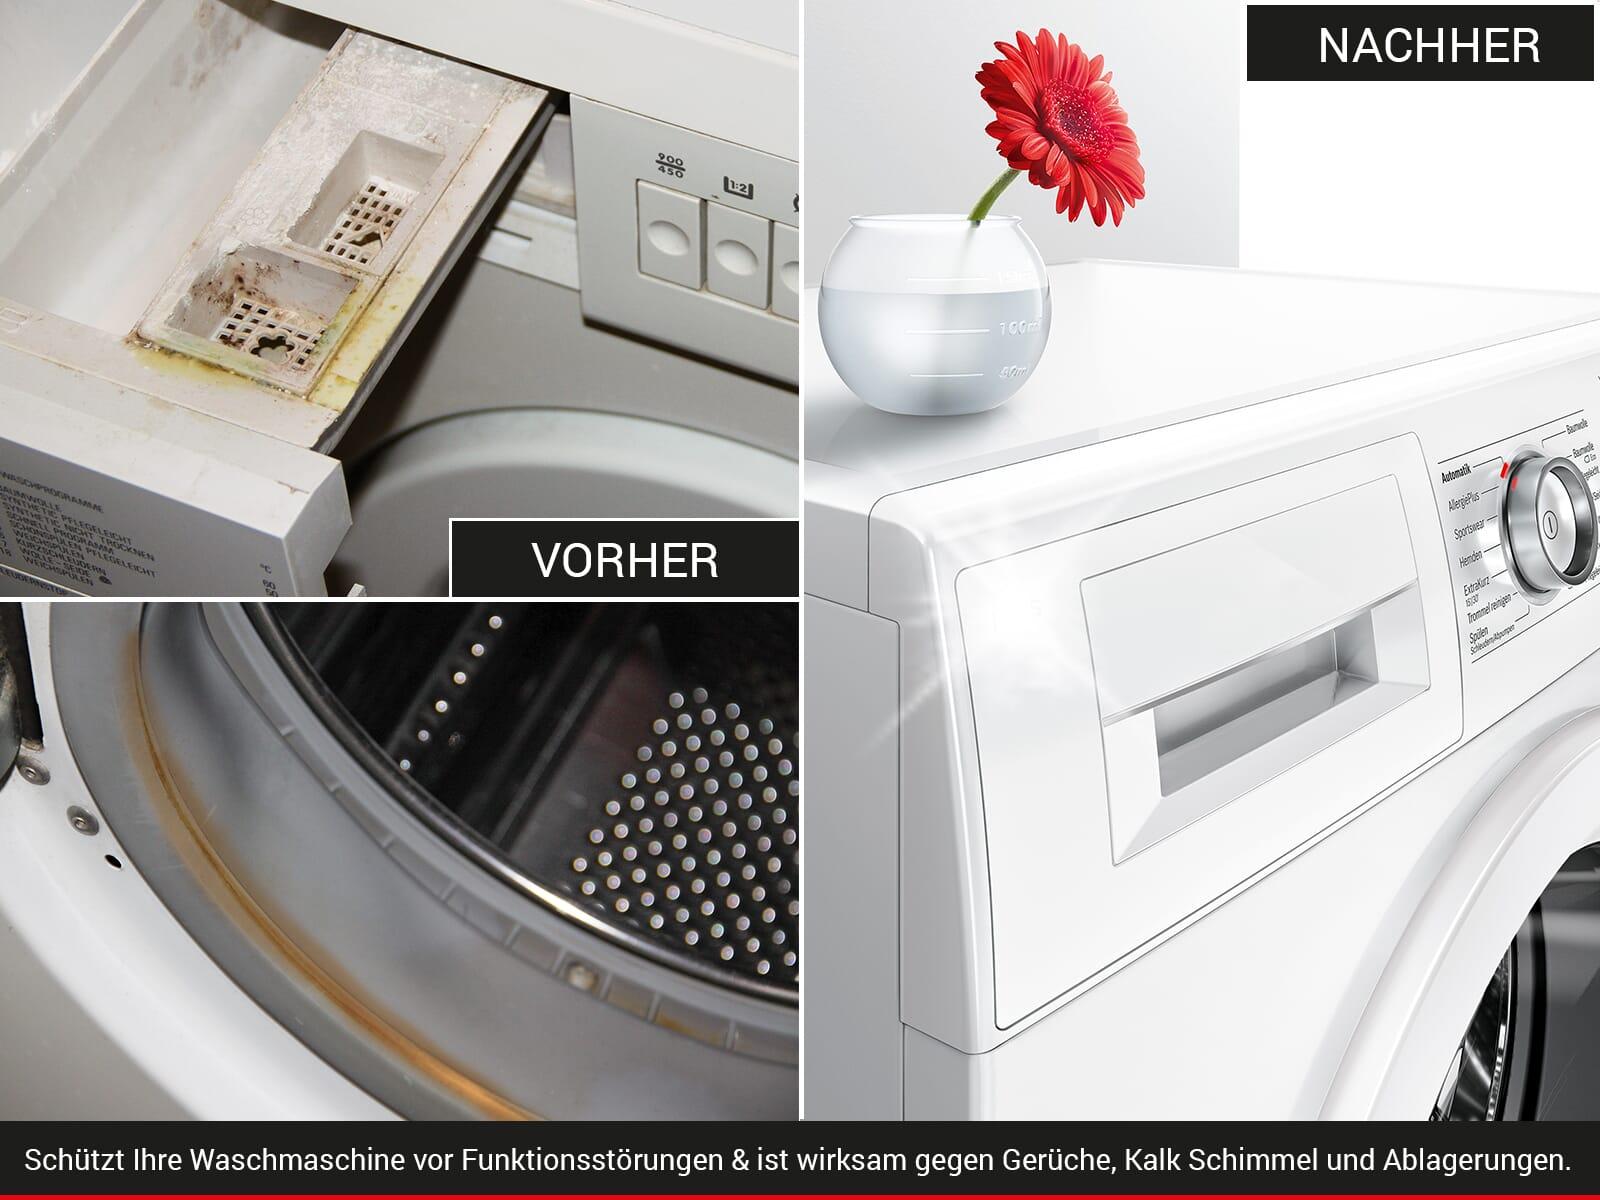 moebelplus Waschmaschinen Systempflege - 4er Set